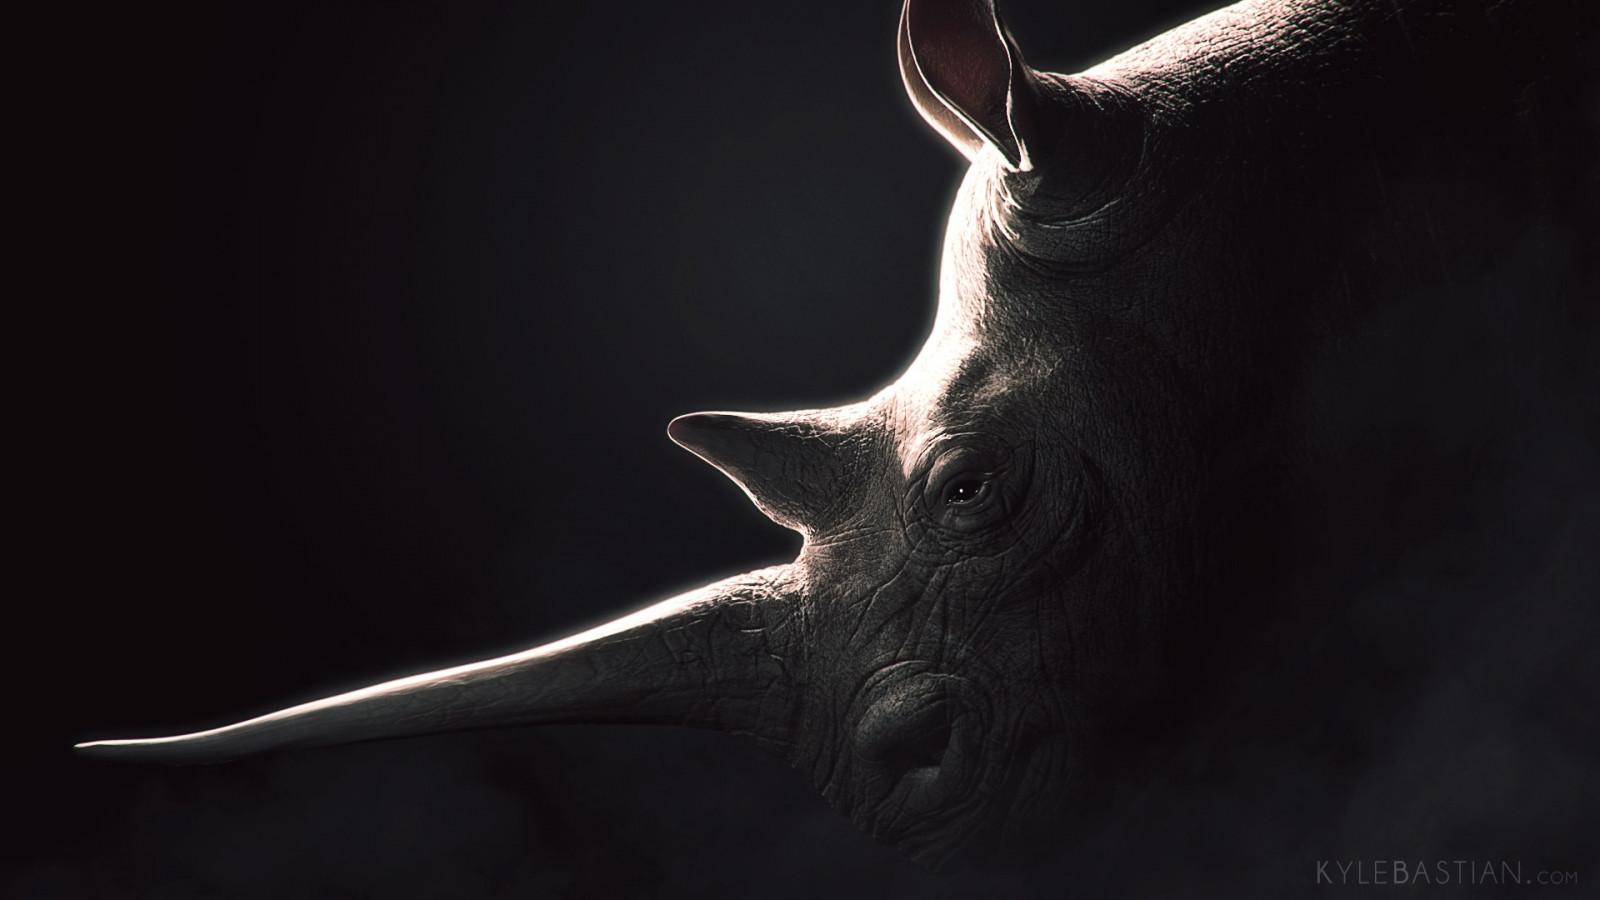 Wallpaper Rhino Head Darkness Bat Computer Wallpaper Close Up